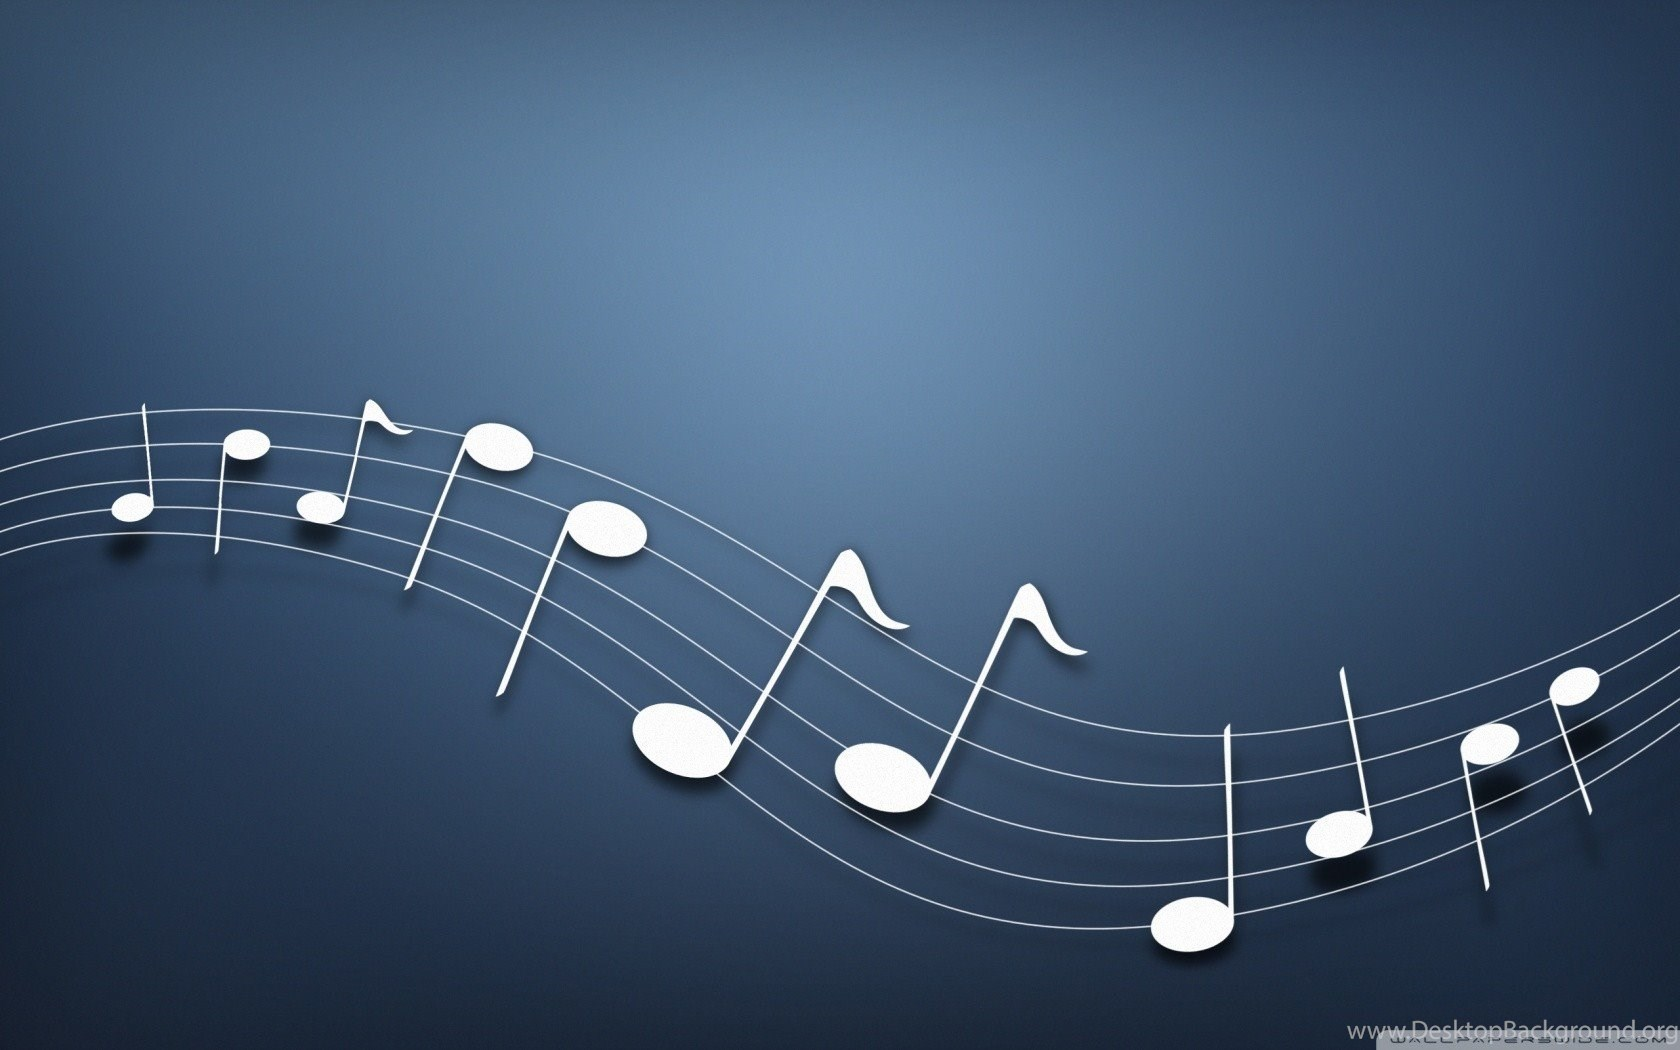 Музыка с картинки, пресвятой